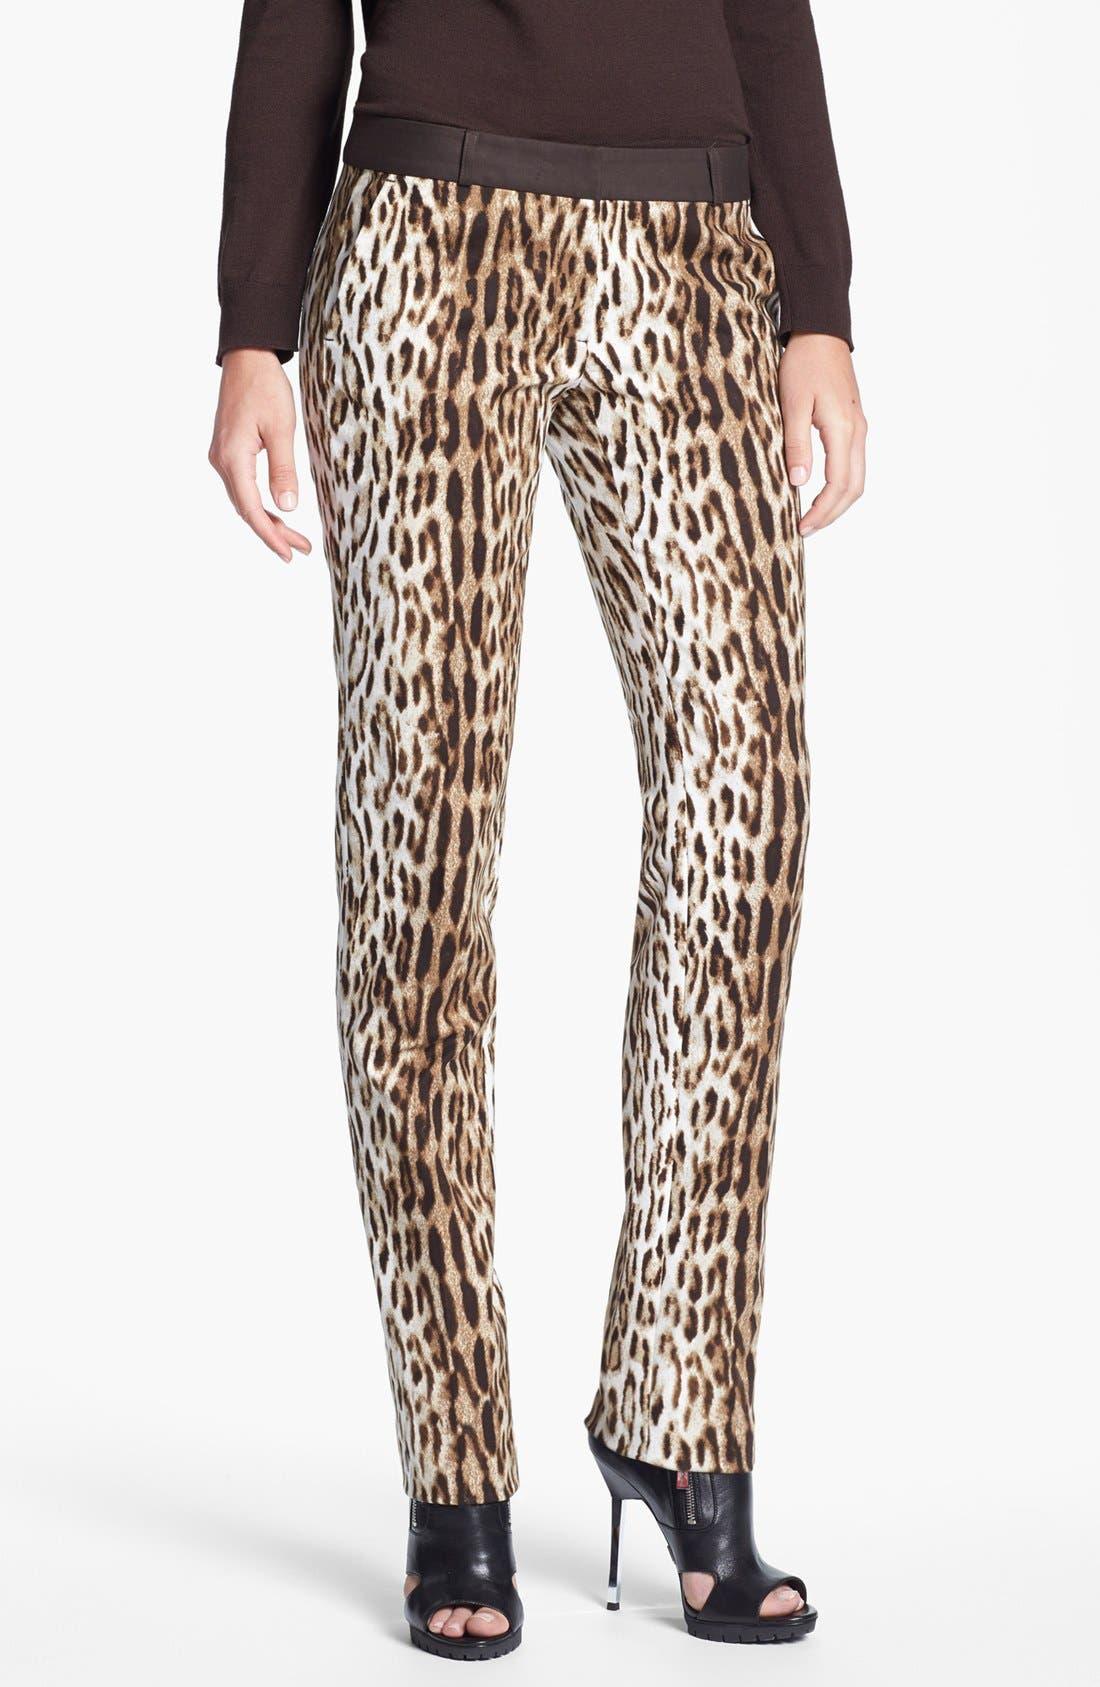 Alternate Image 1 Selected - MICHAEL Michael Kors 'Sexy Skinny' Leopard Print Stretch Pants (Regular & Petite)